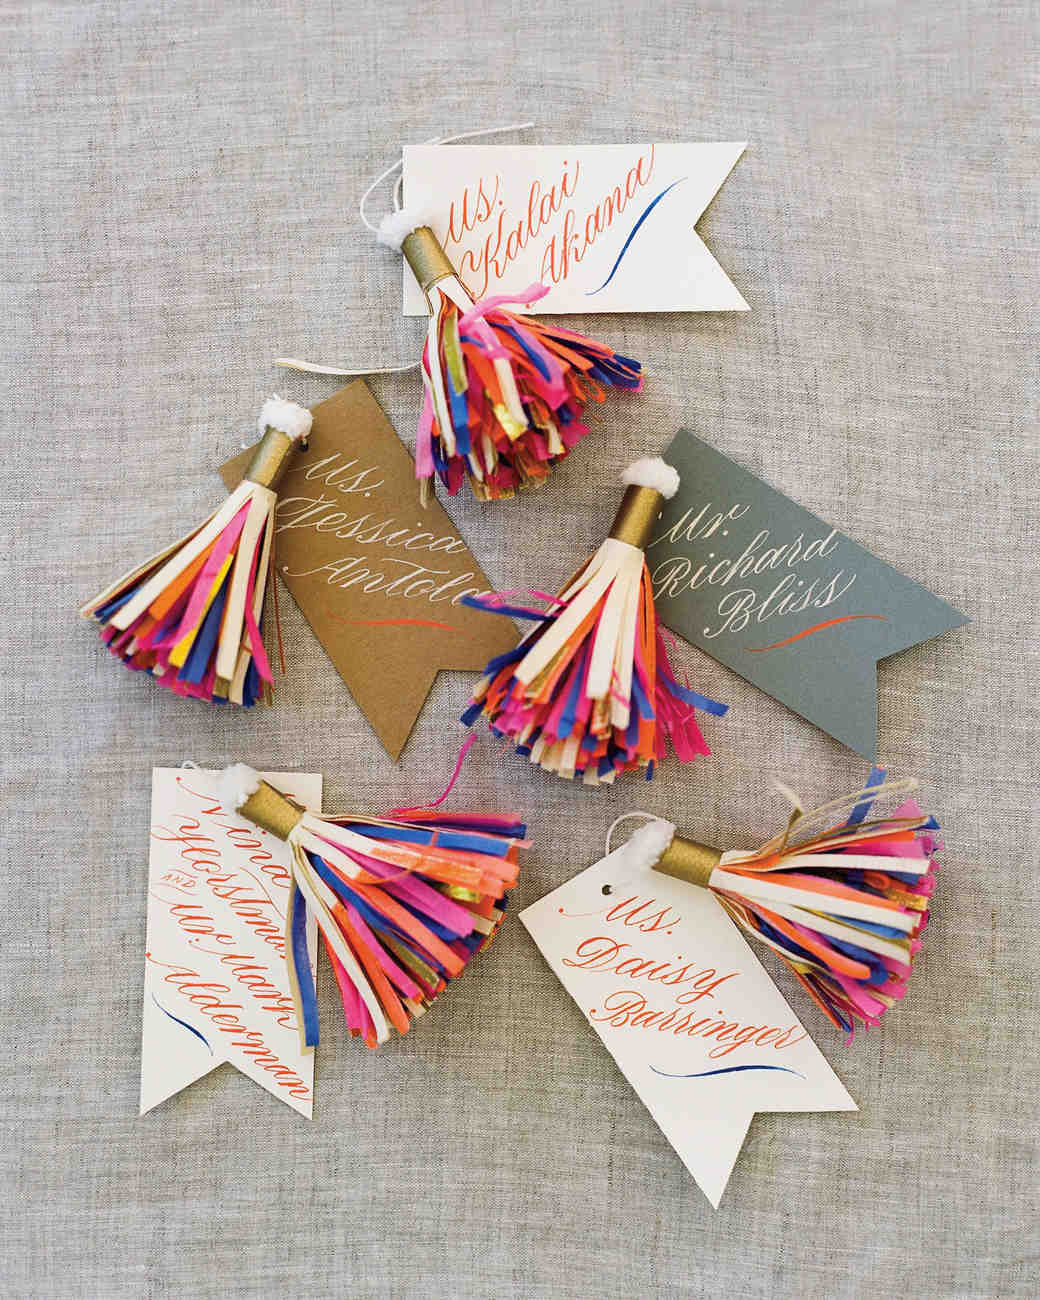 mfiona-peter-wedding-vermont-escort-cards-9629.16r.2015.47-d112512.jpg